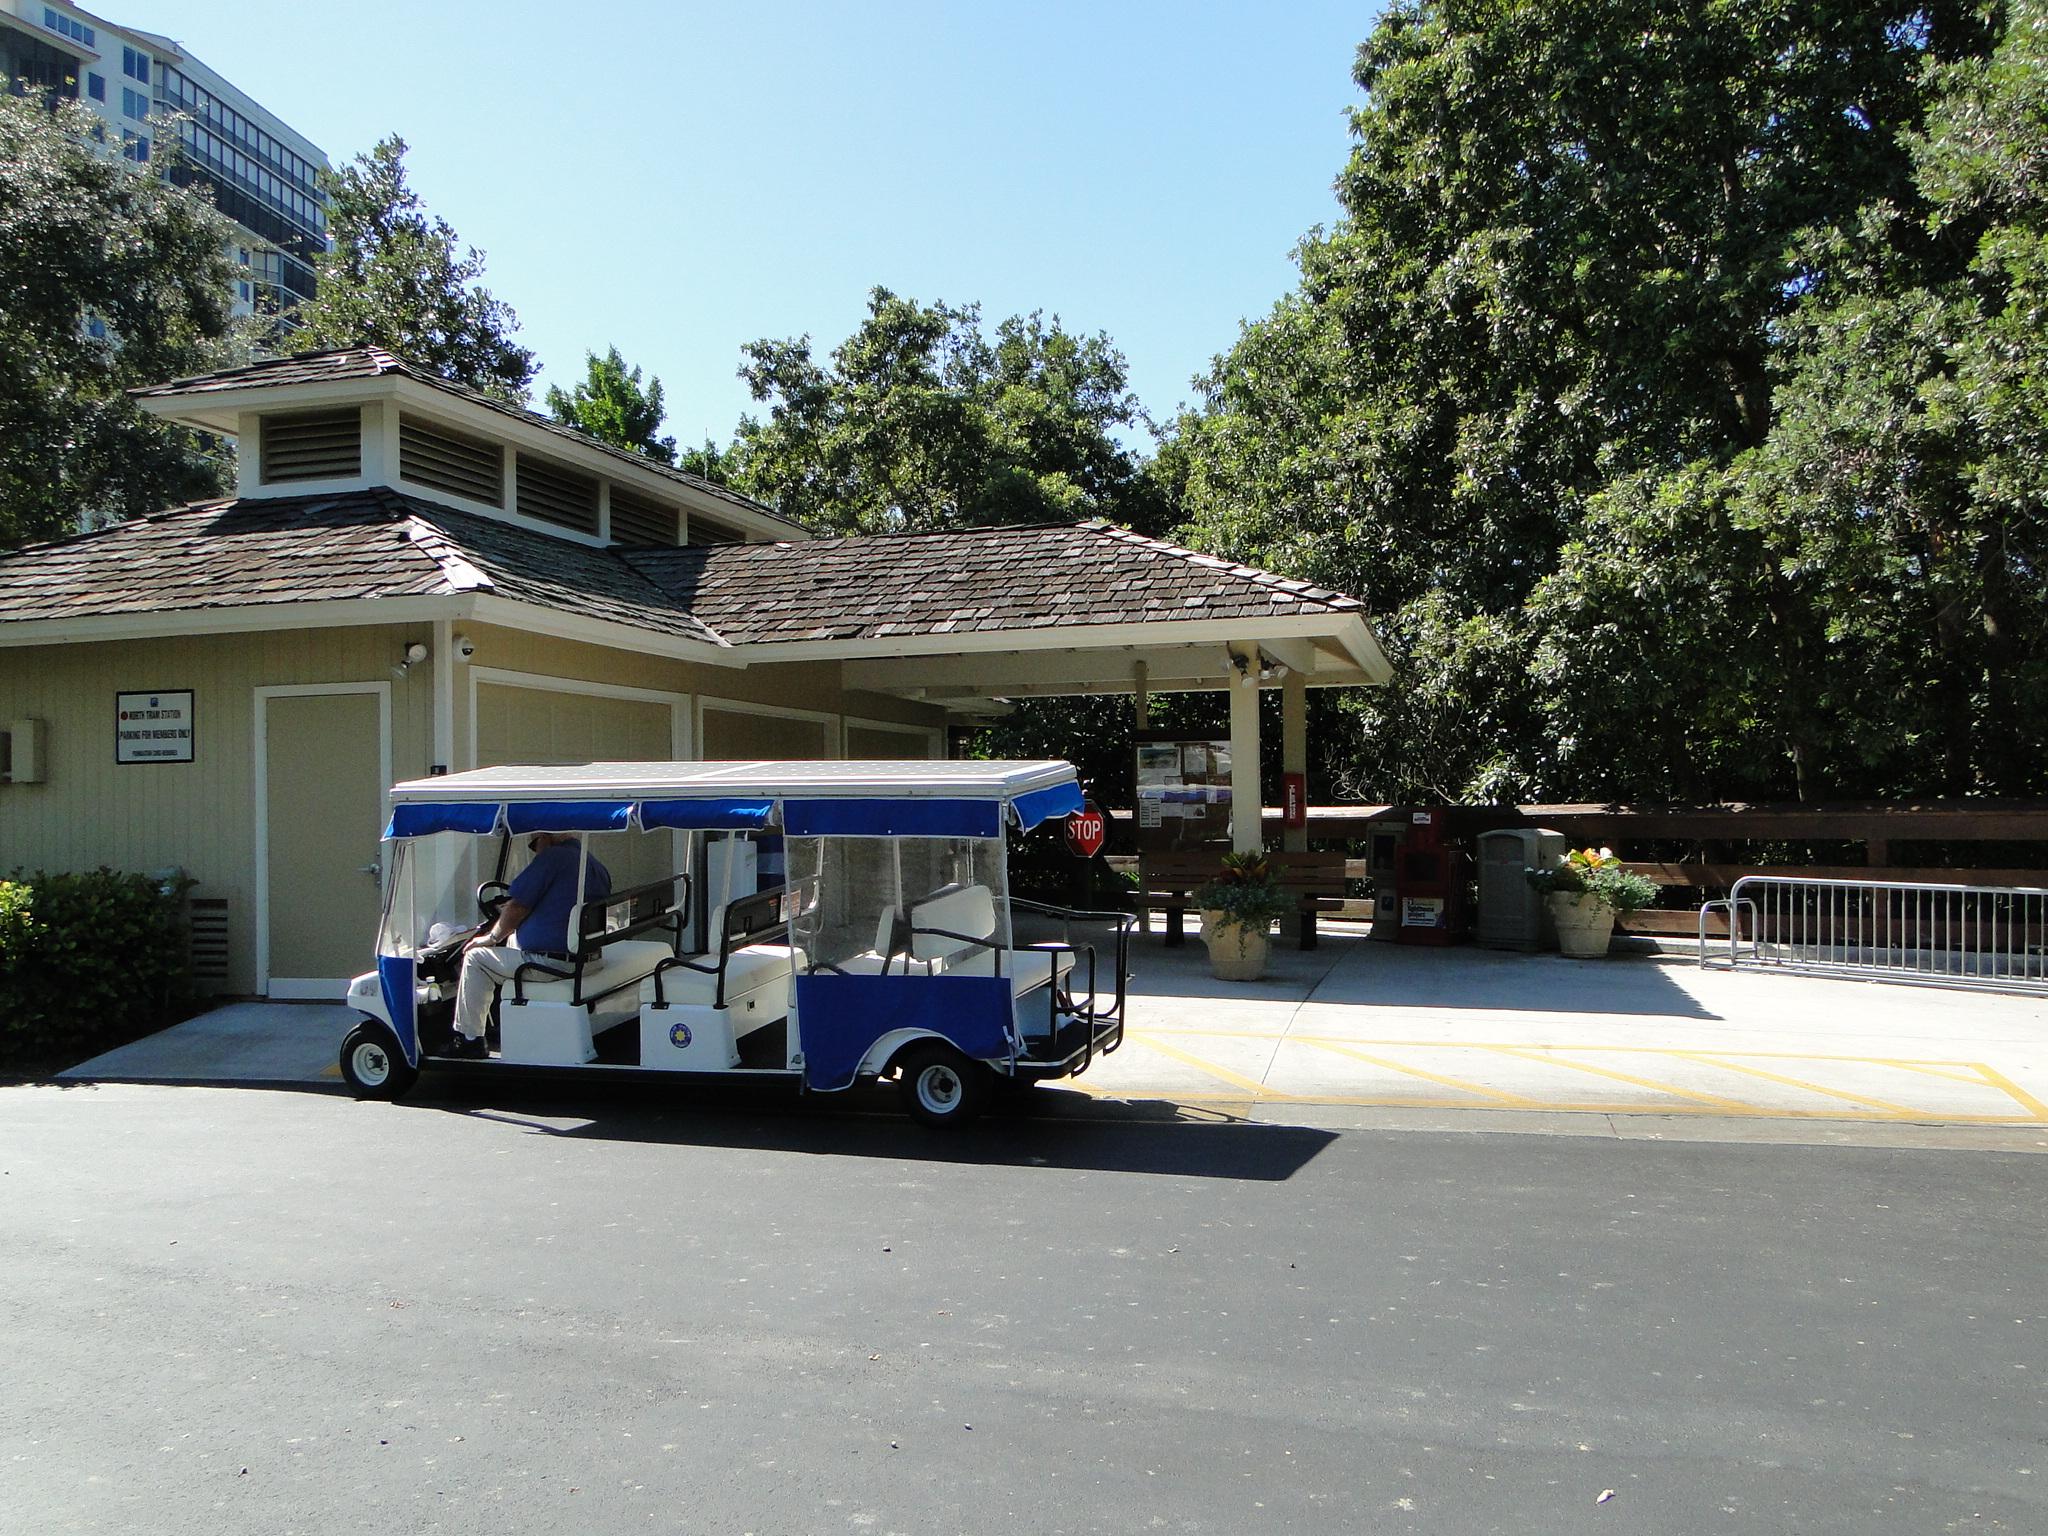 Pelican Bay North Station Beach Tram